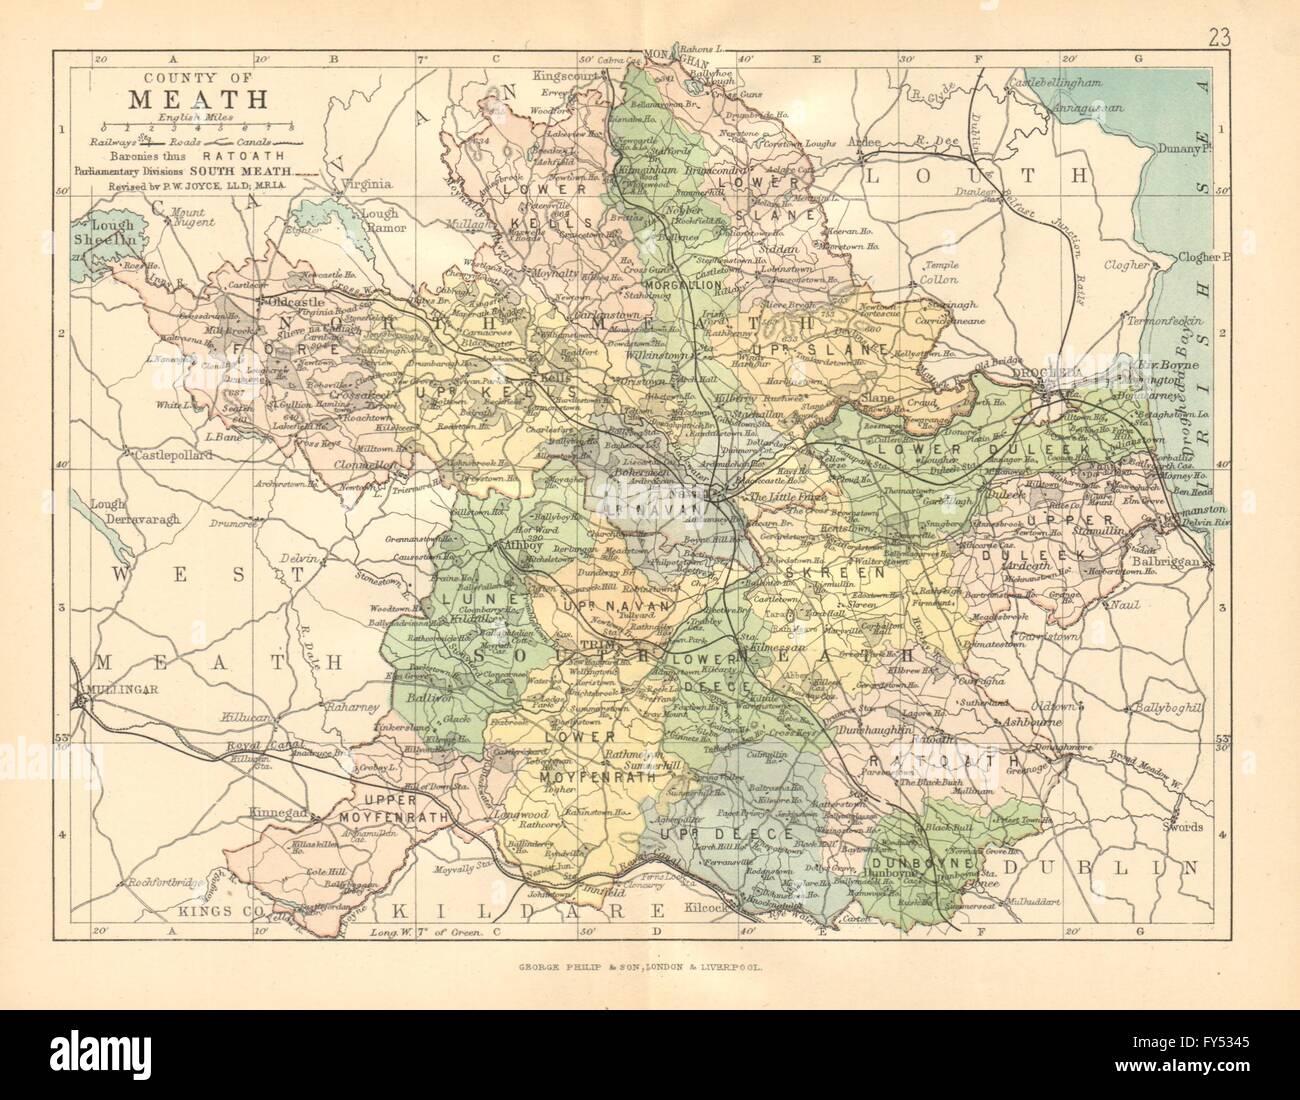 County Meath Antique County Map Leinster Ireland Bartholomew